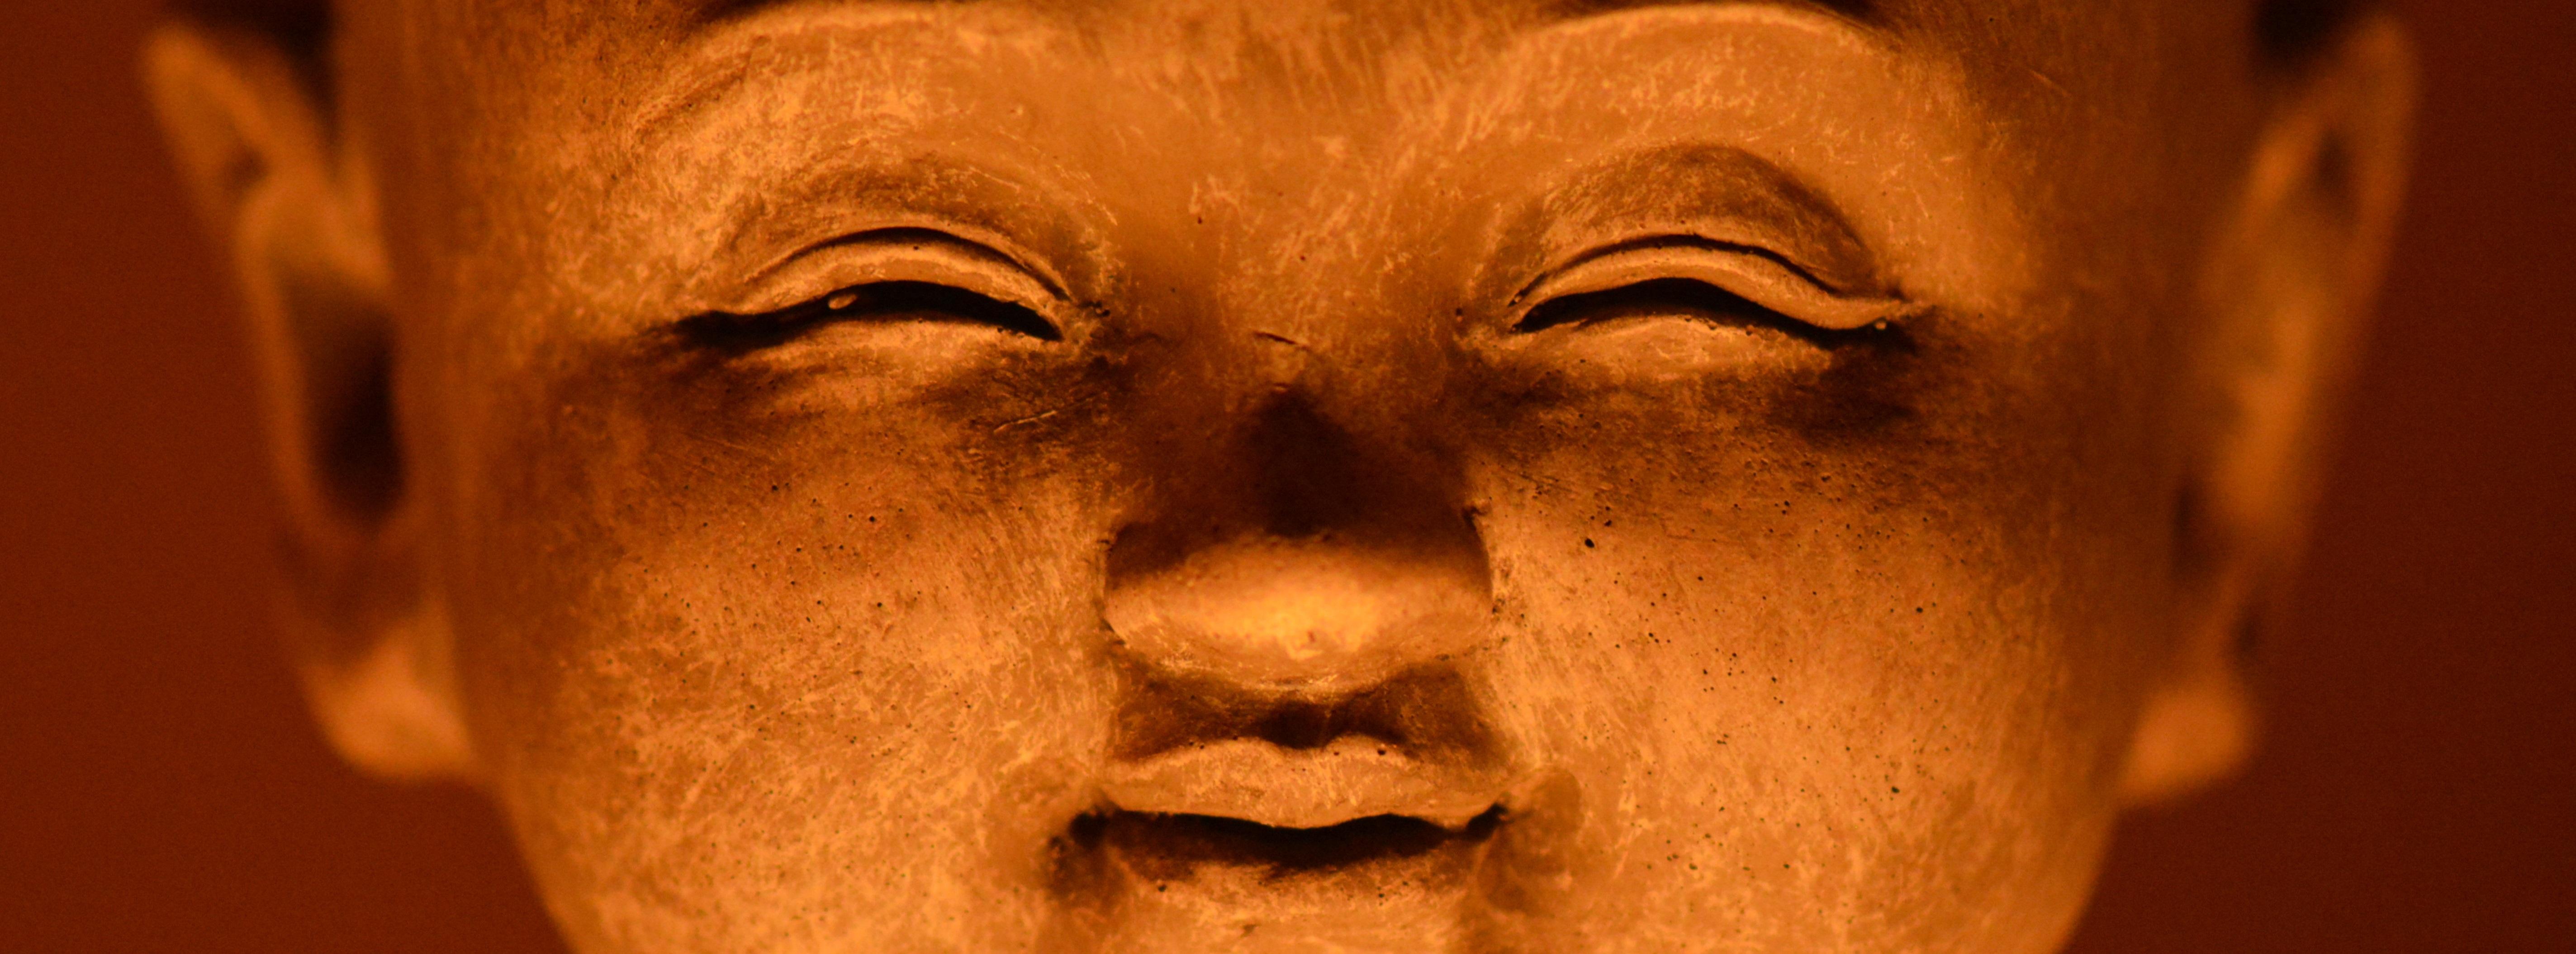 buddha-513709